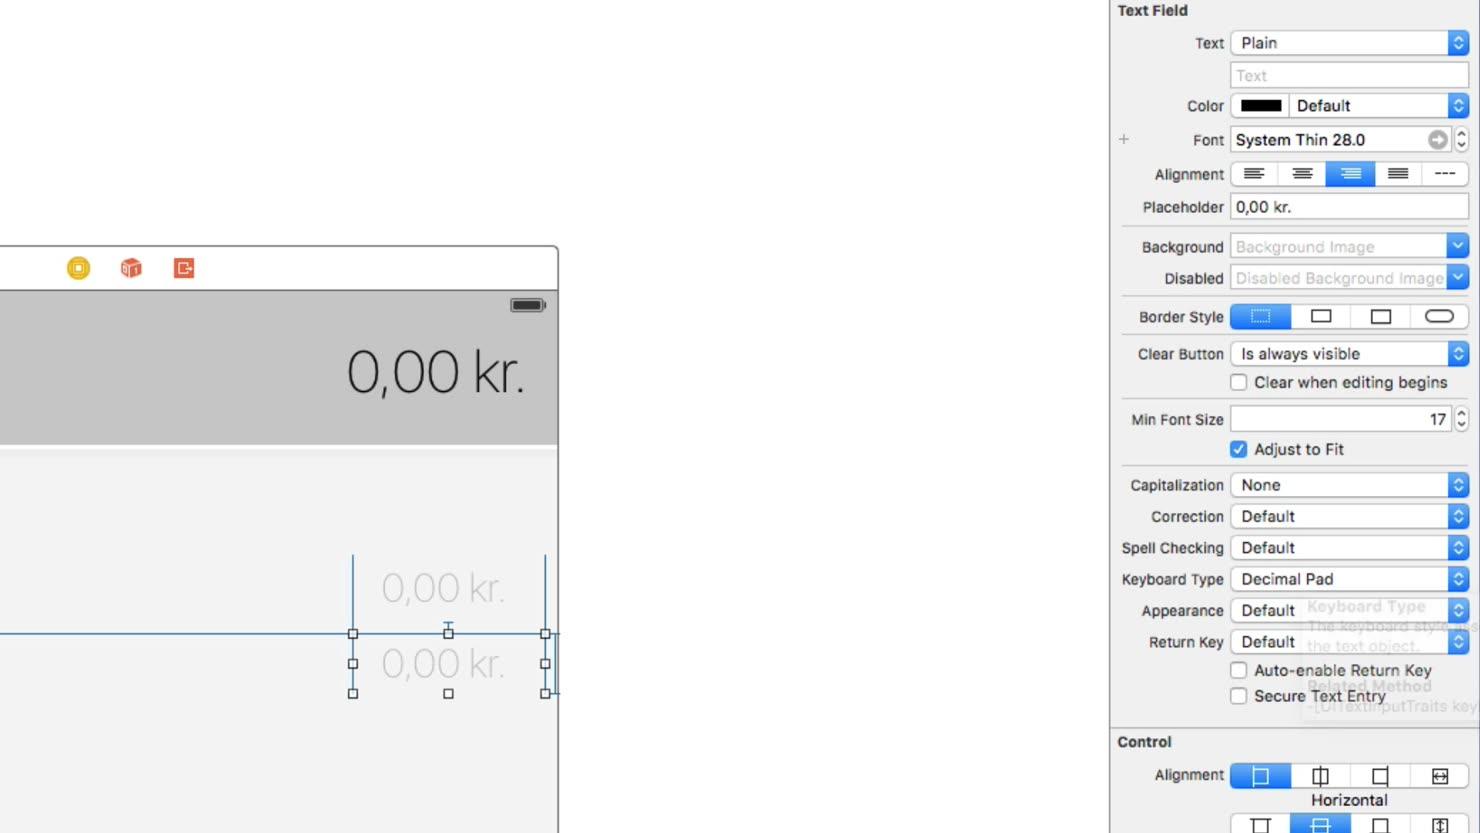 Byg flere elementer som bl.a. tekst-felter med constraints